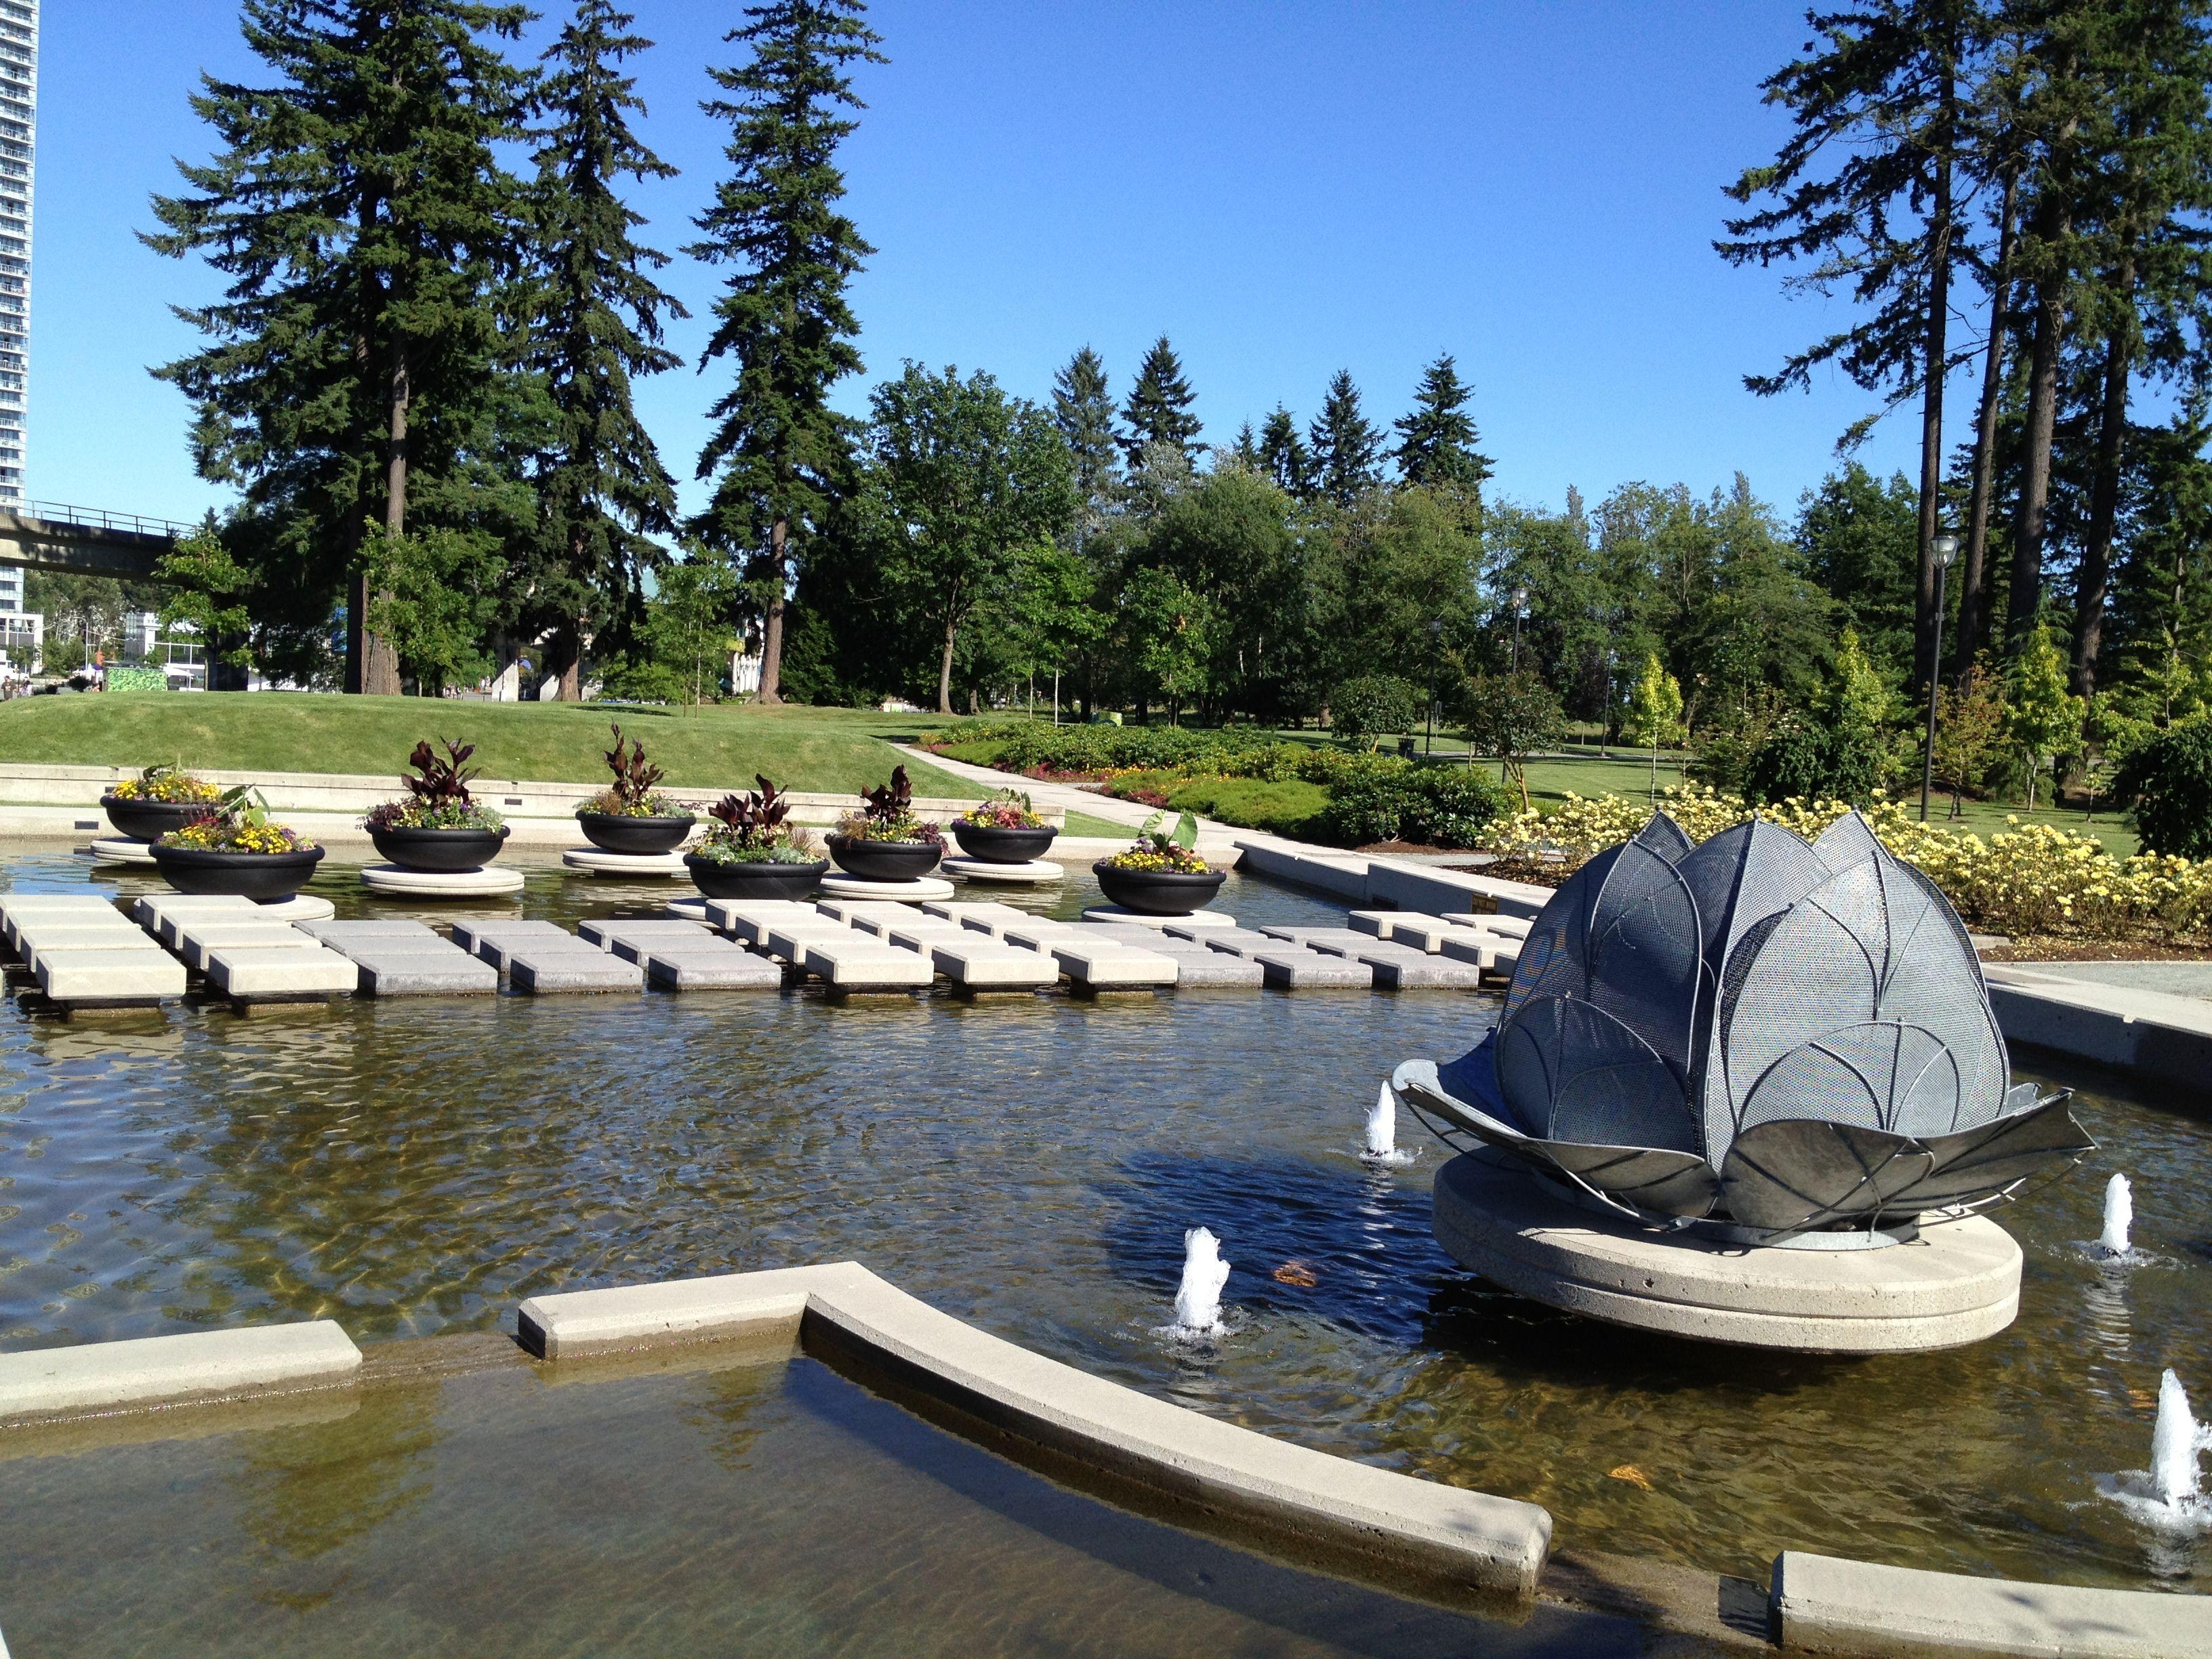 Holland Park in Surrey, BC #beautifulbc #greenspace